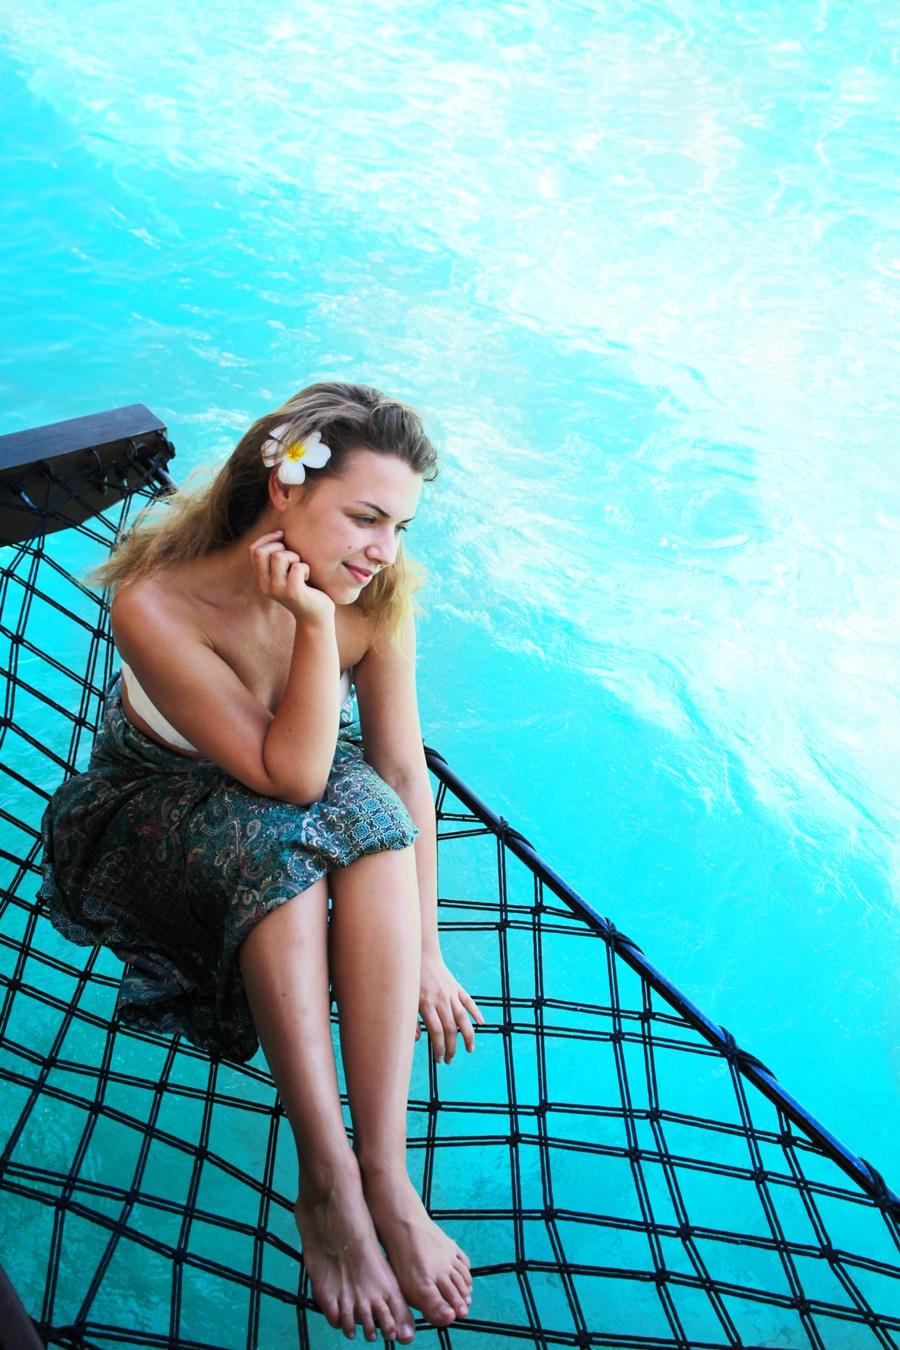 jasmin fatschild spa beach pool